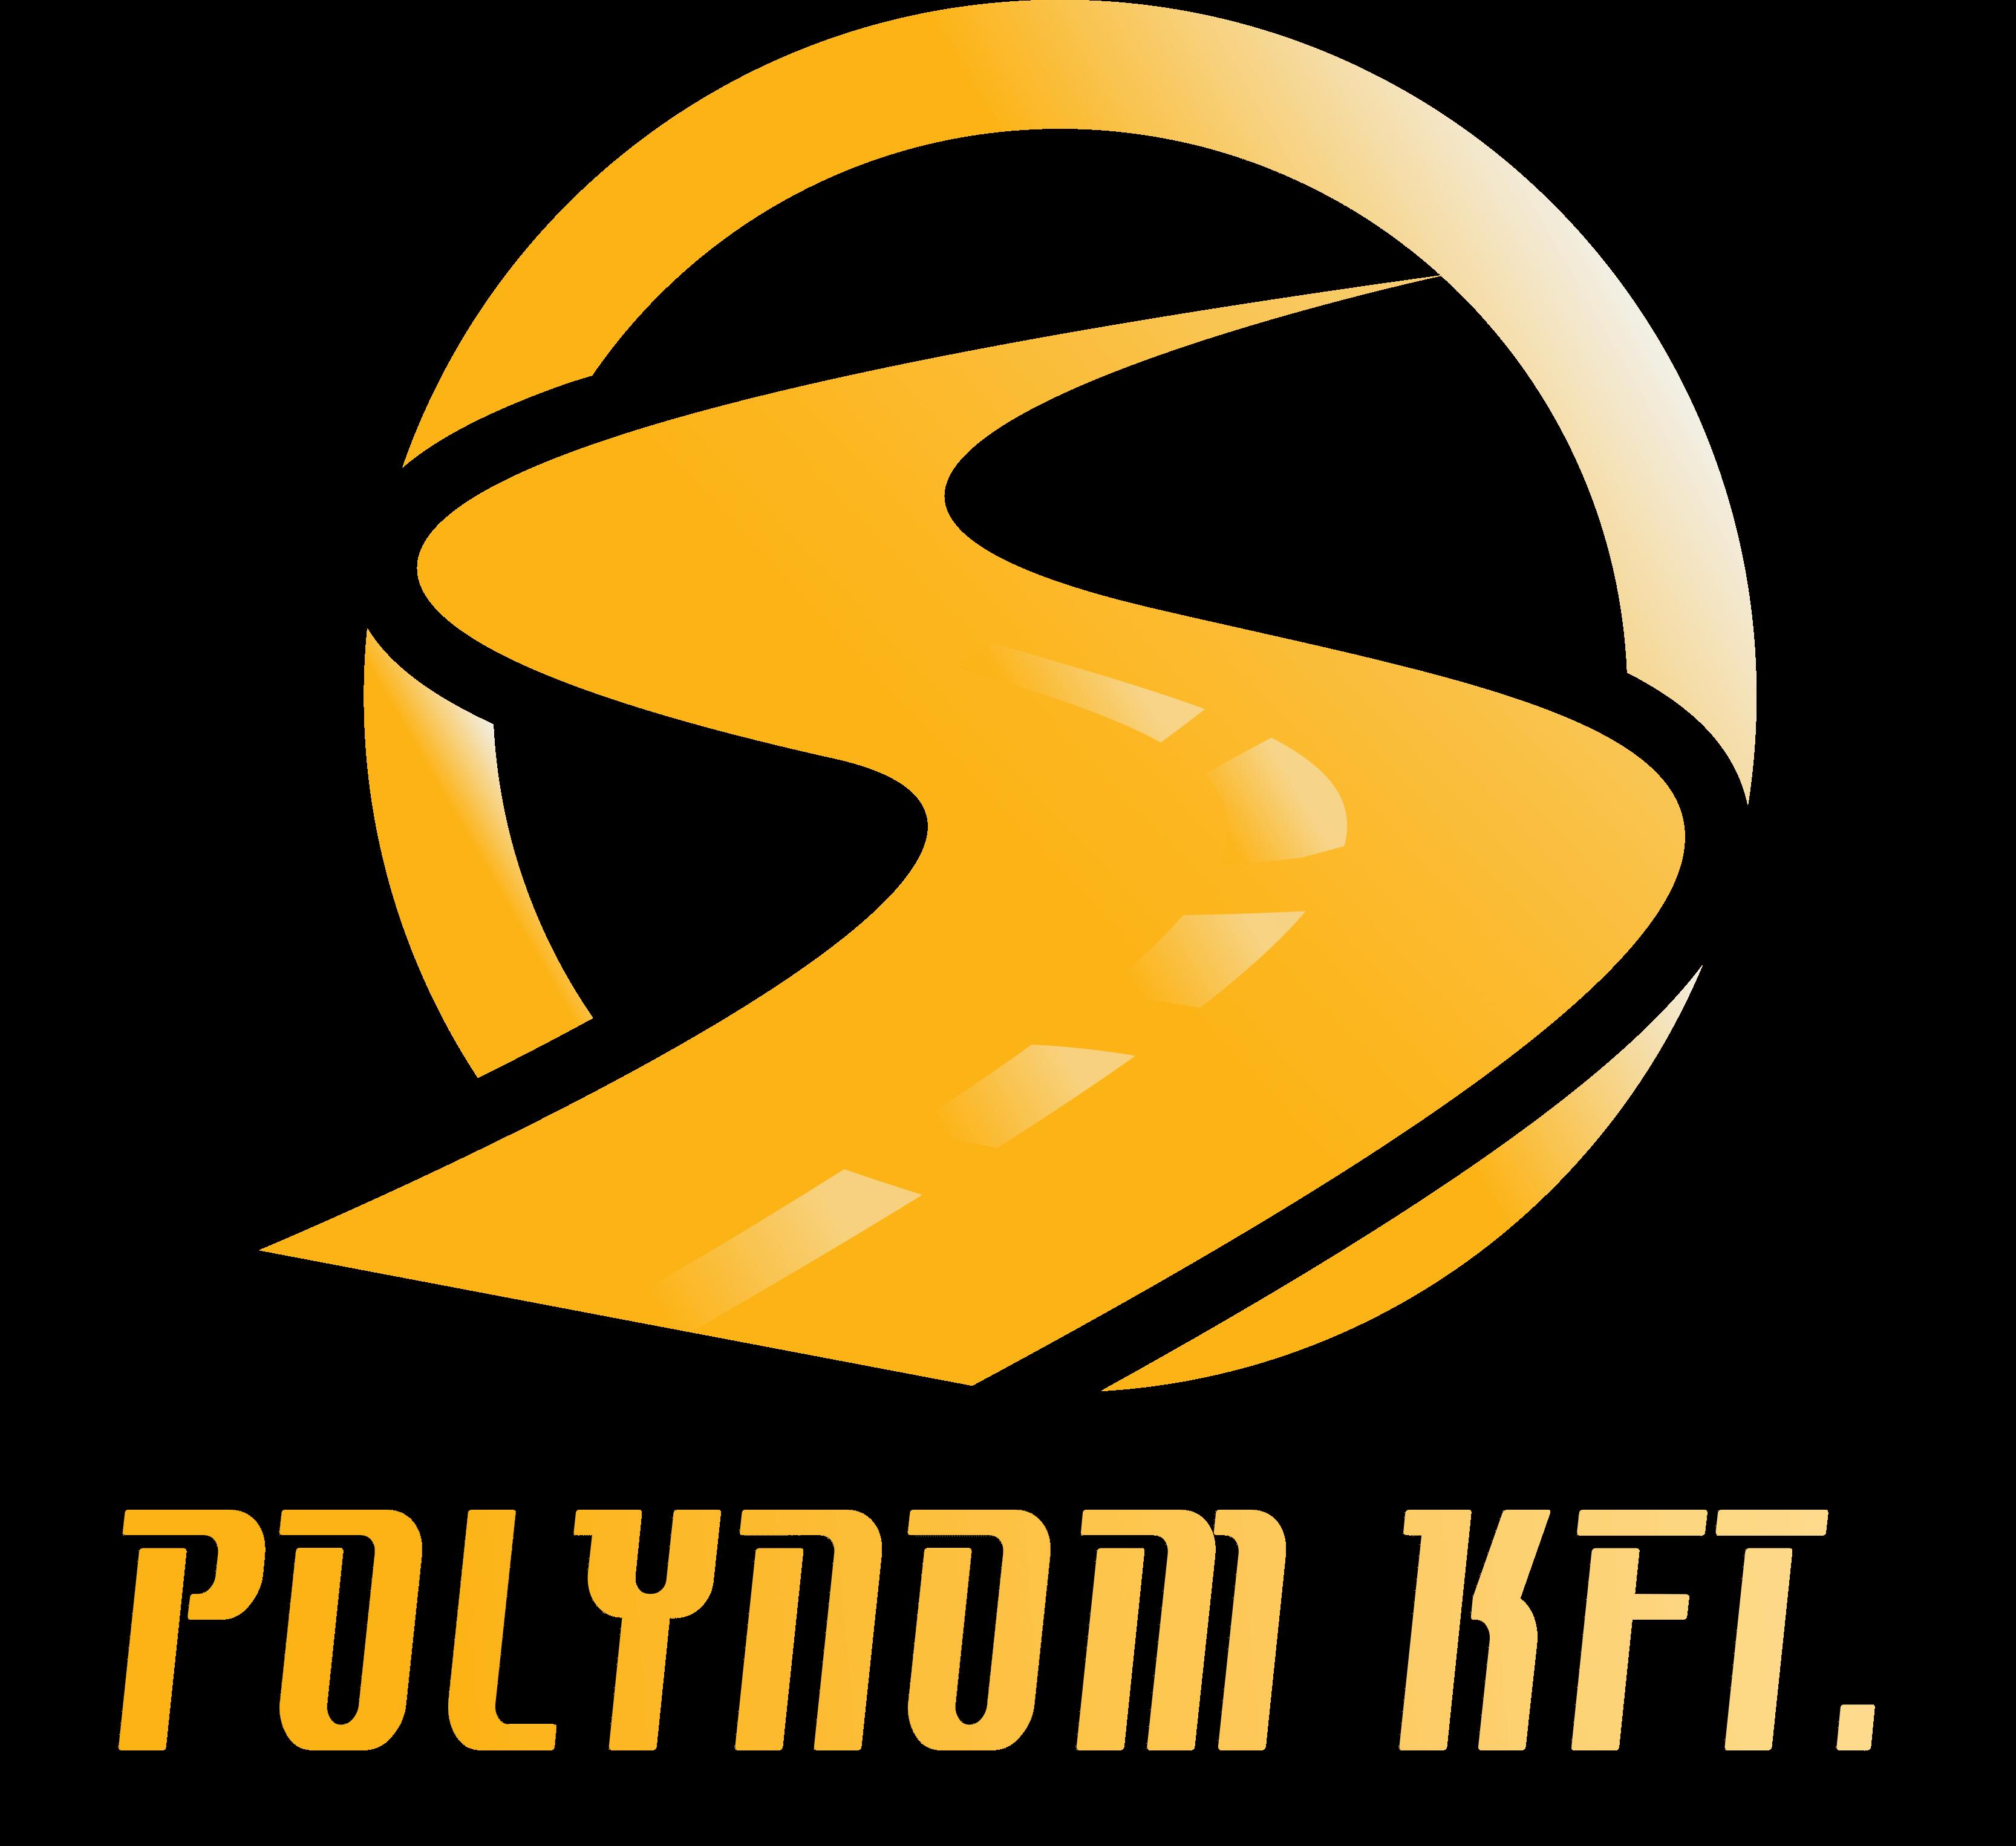 Polynom Kft.